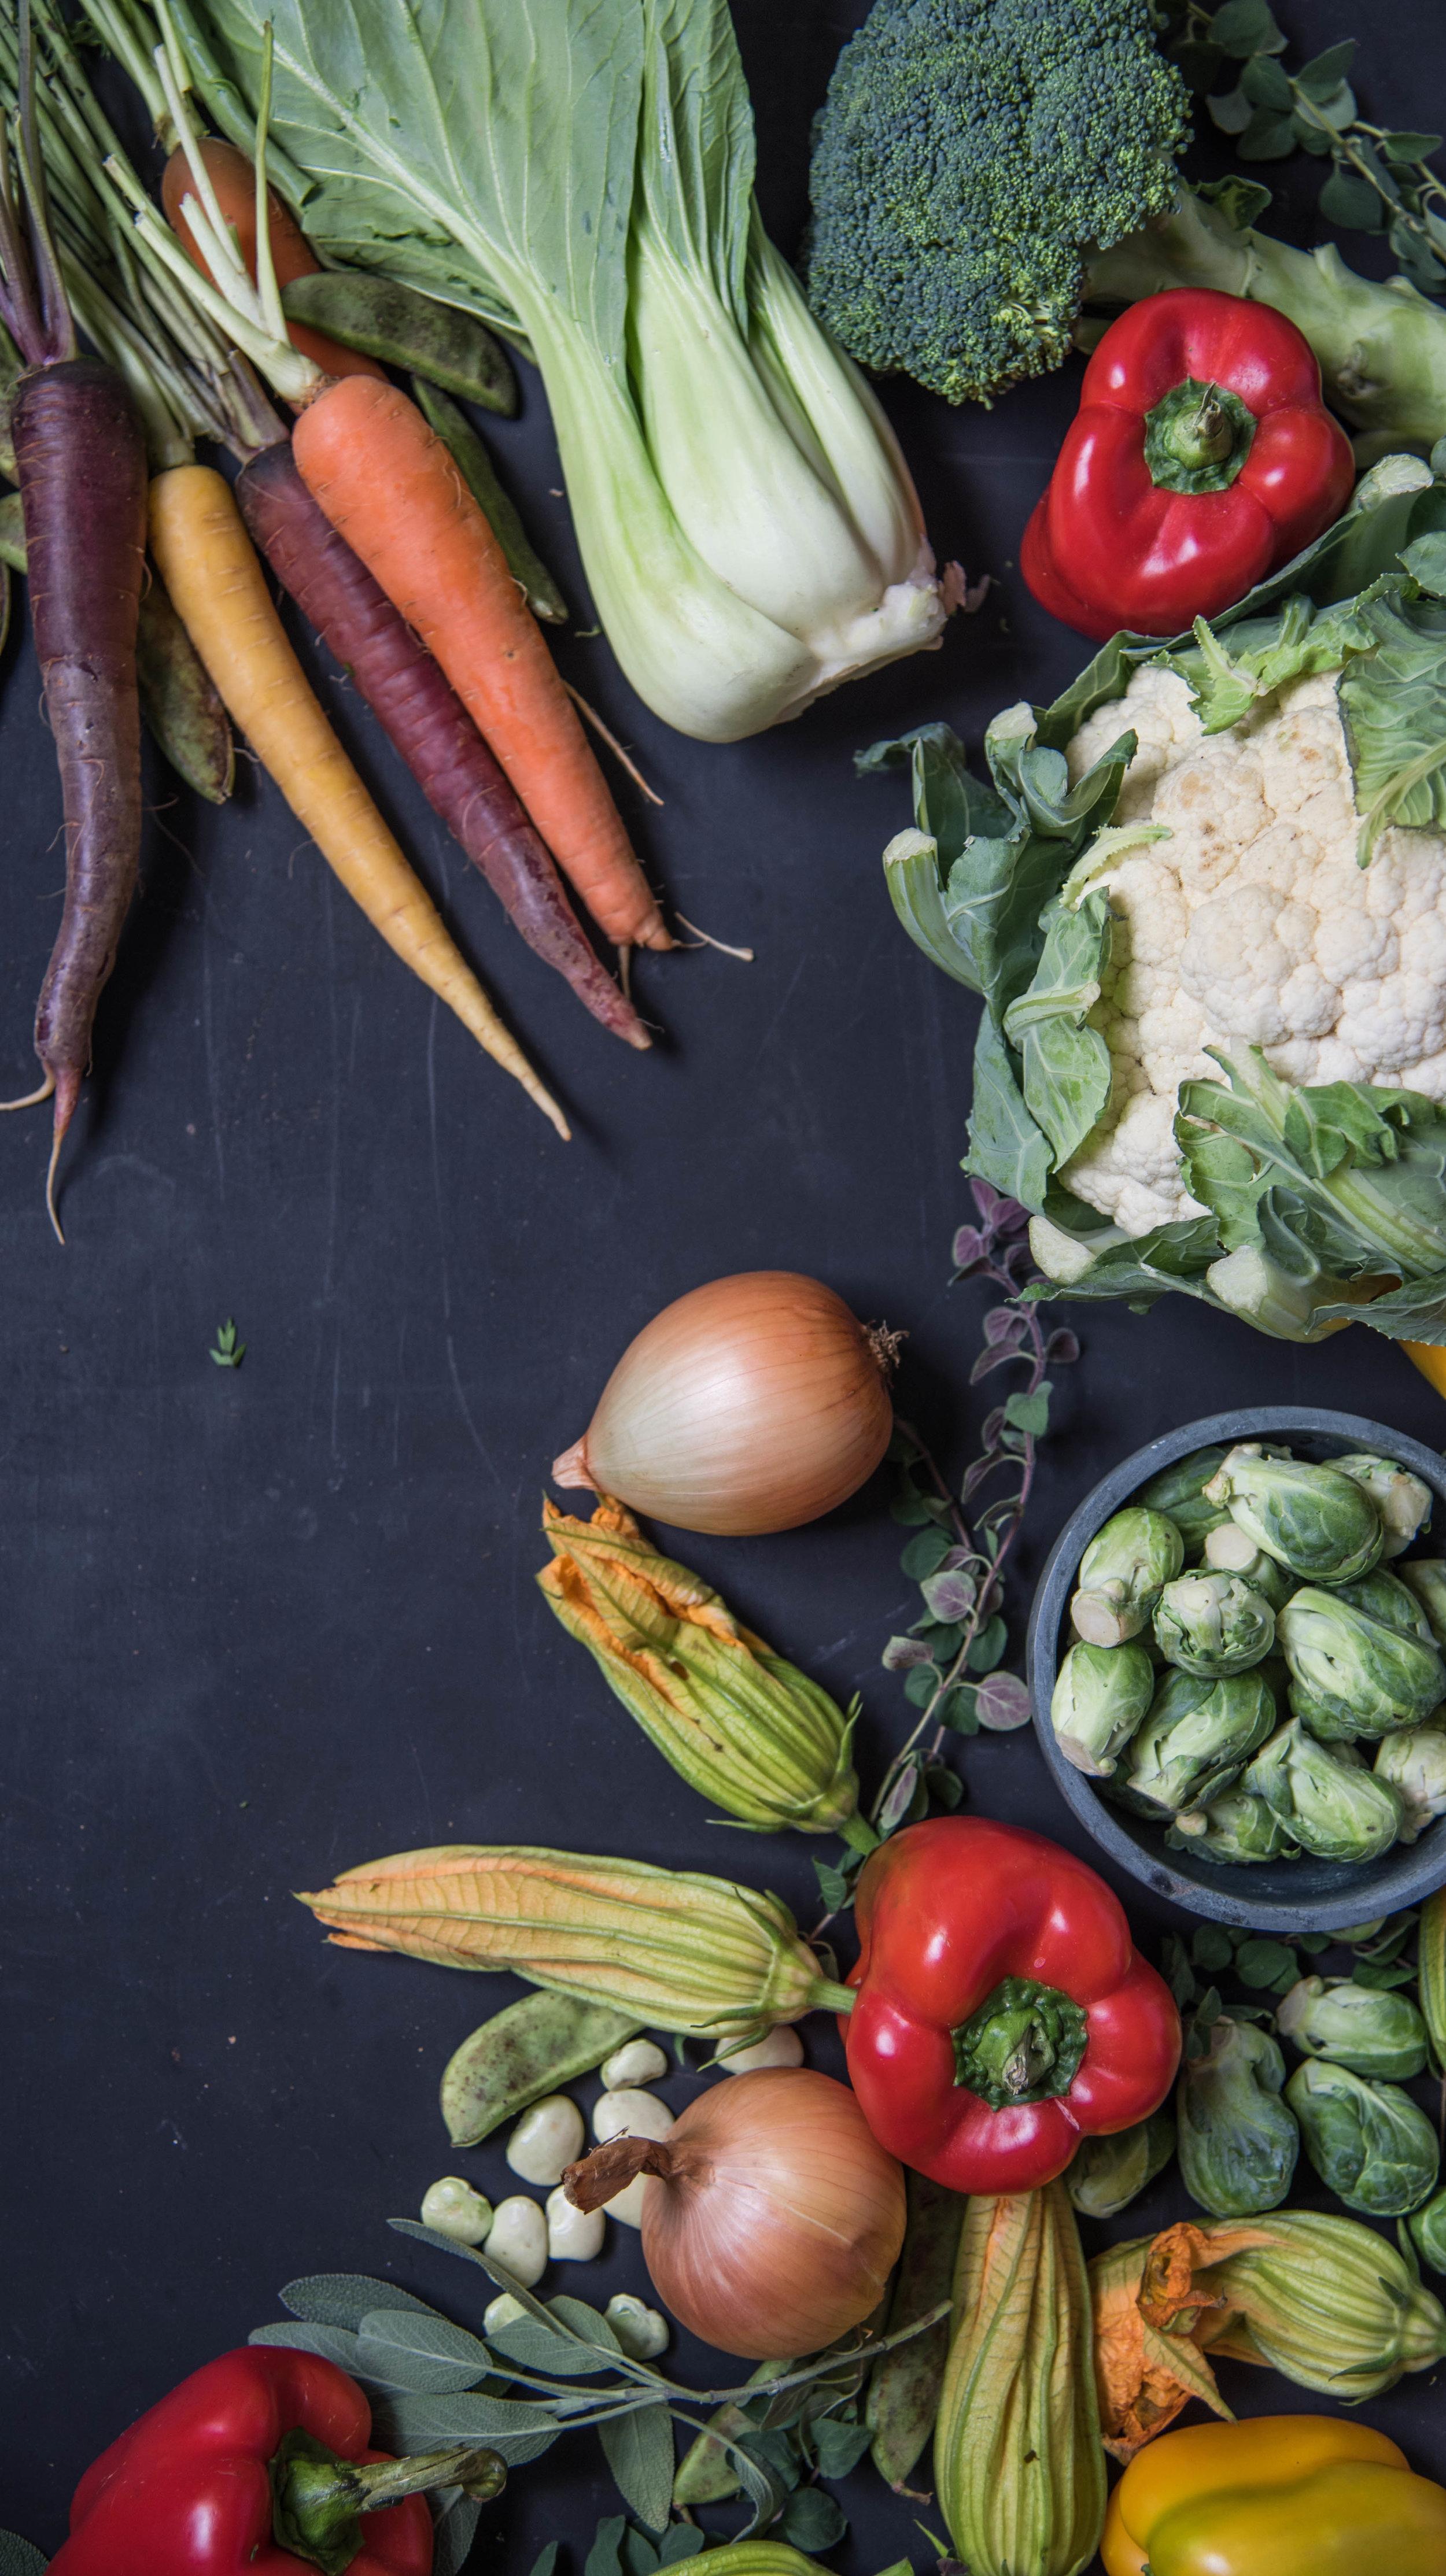 ROSE & IVY Journal New Cookbooks for Fall Martha Stewart Vegetables